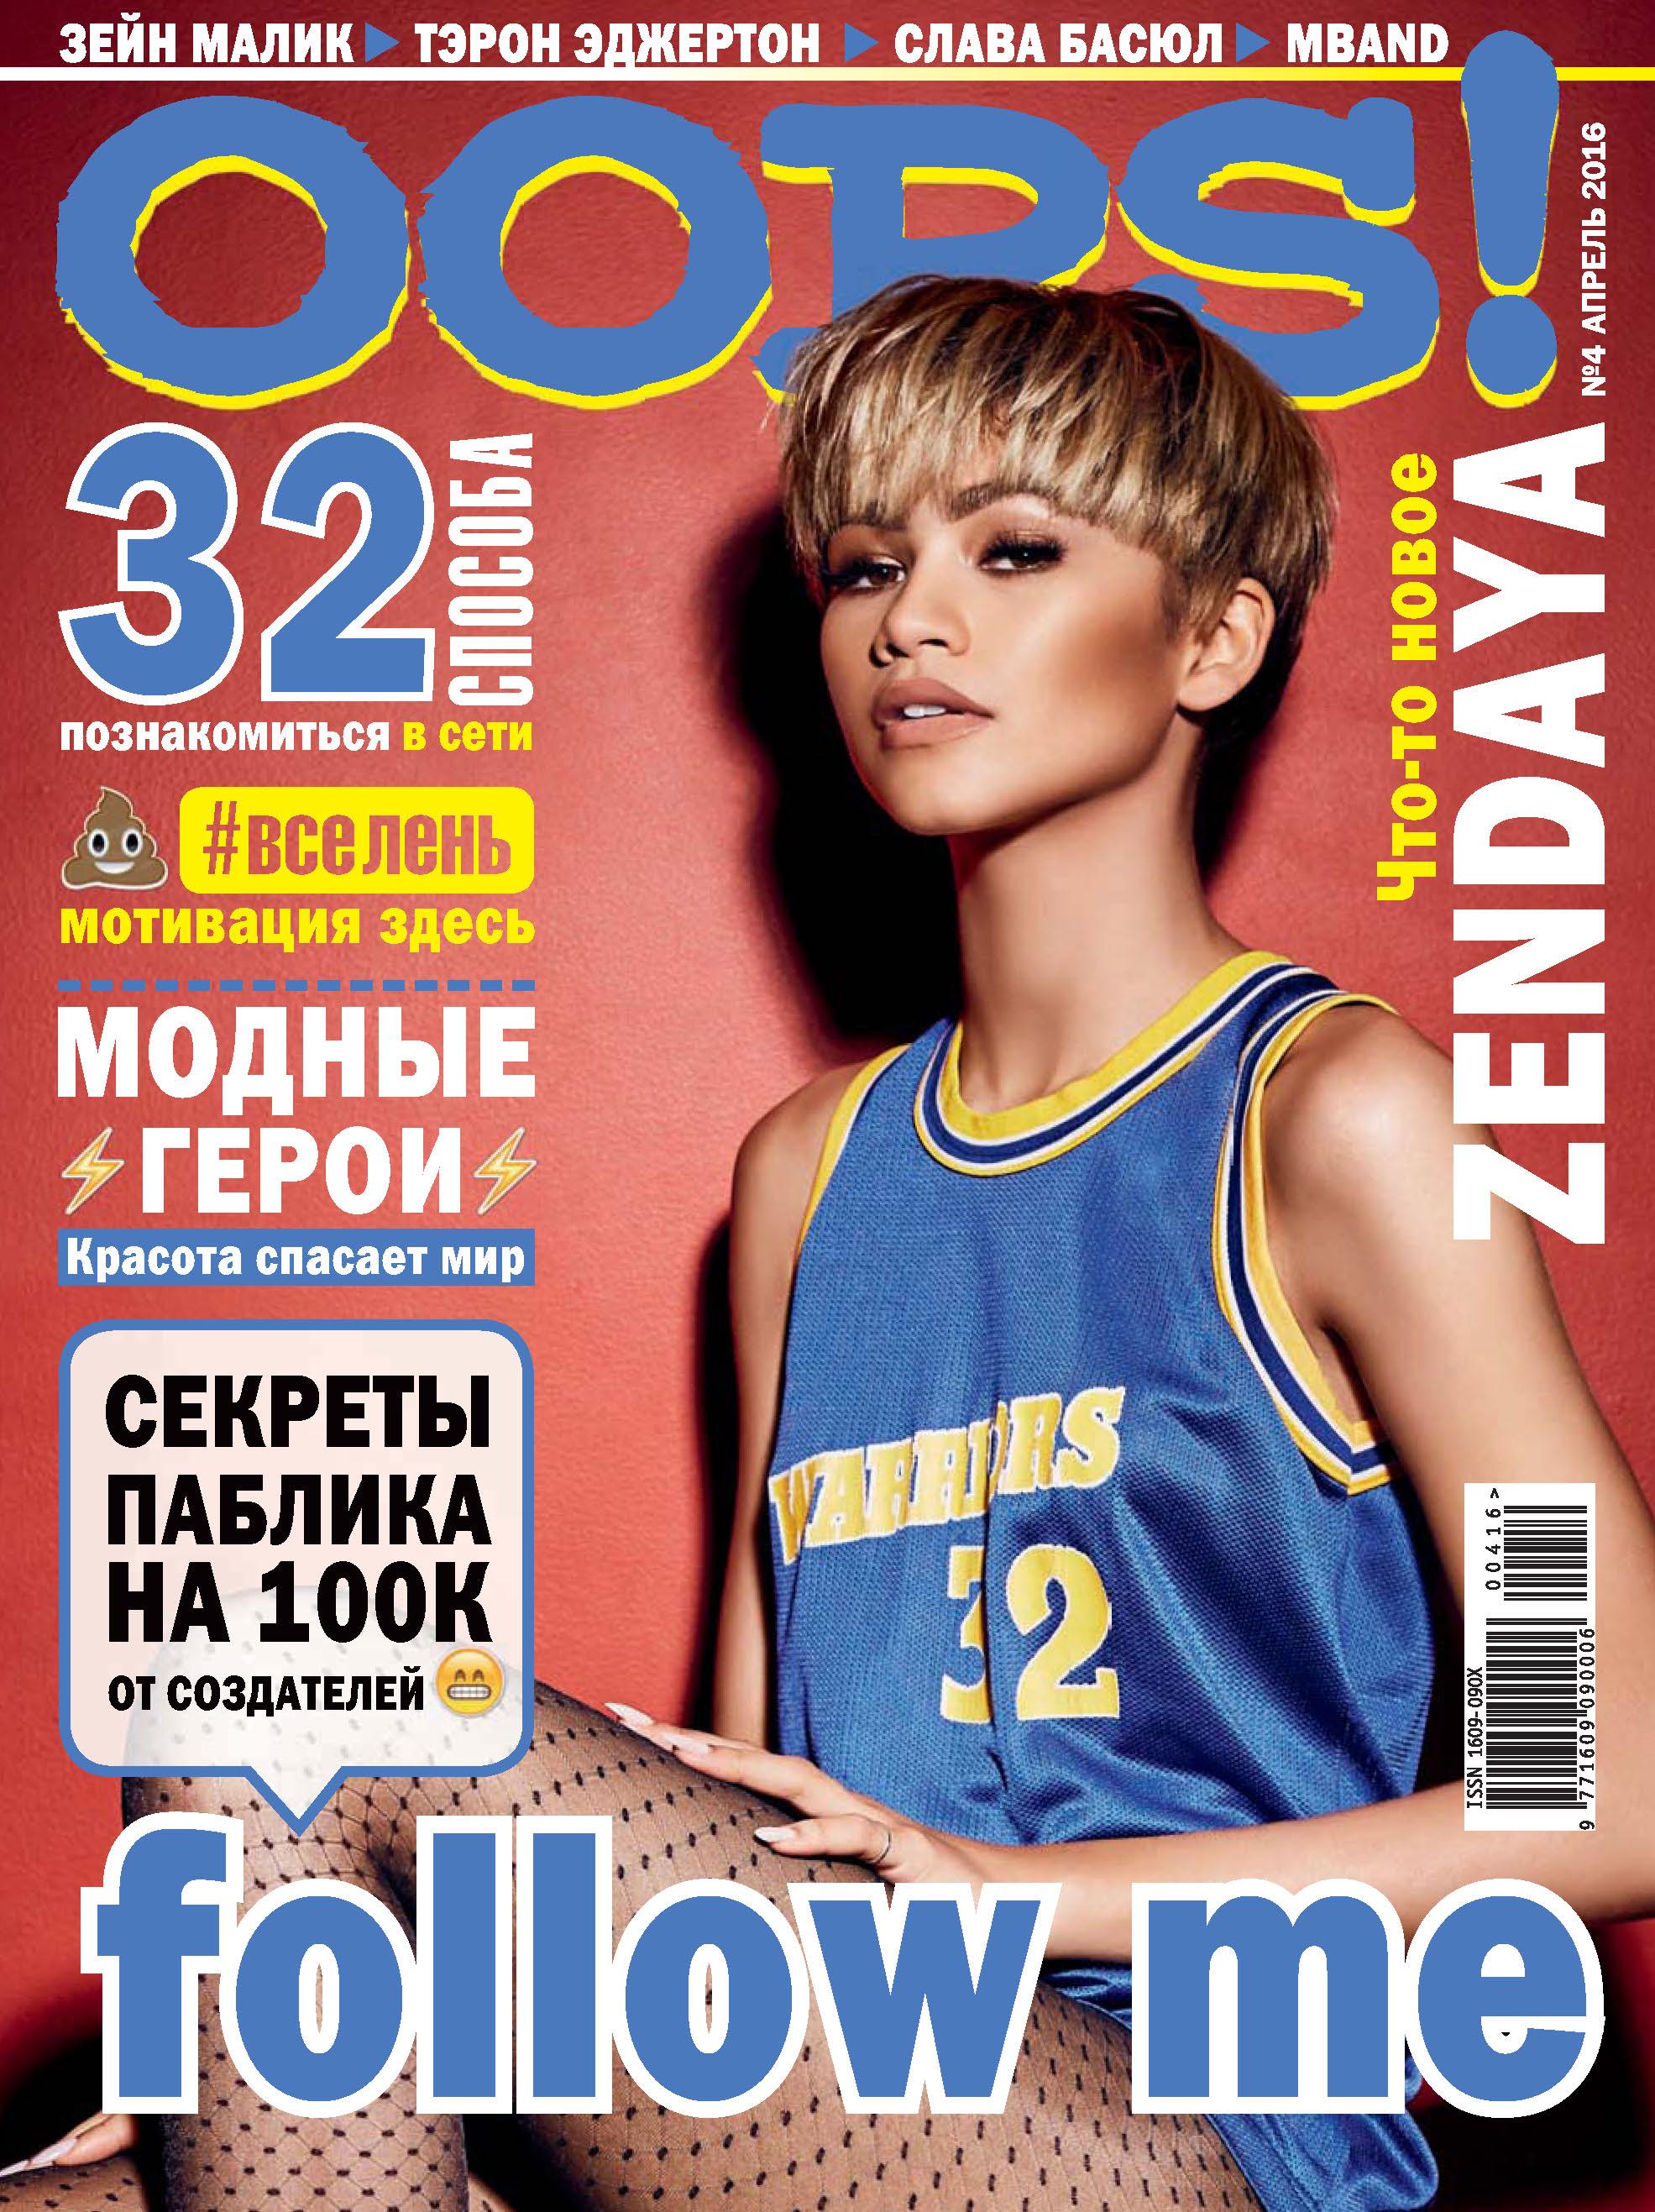 ИД «Бурда» Журнал Oops! №04/2016 журнал oops читать онлайн